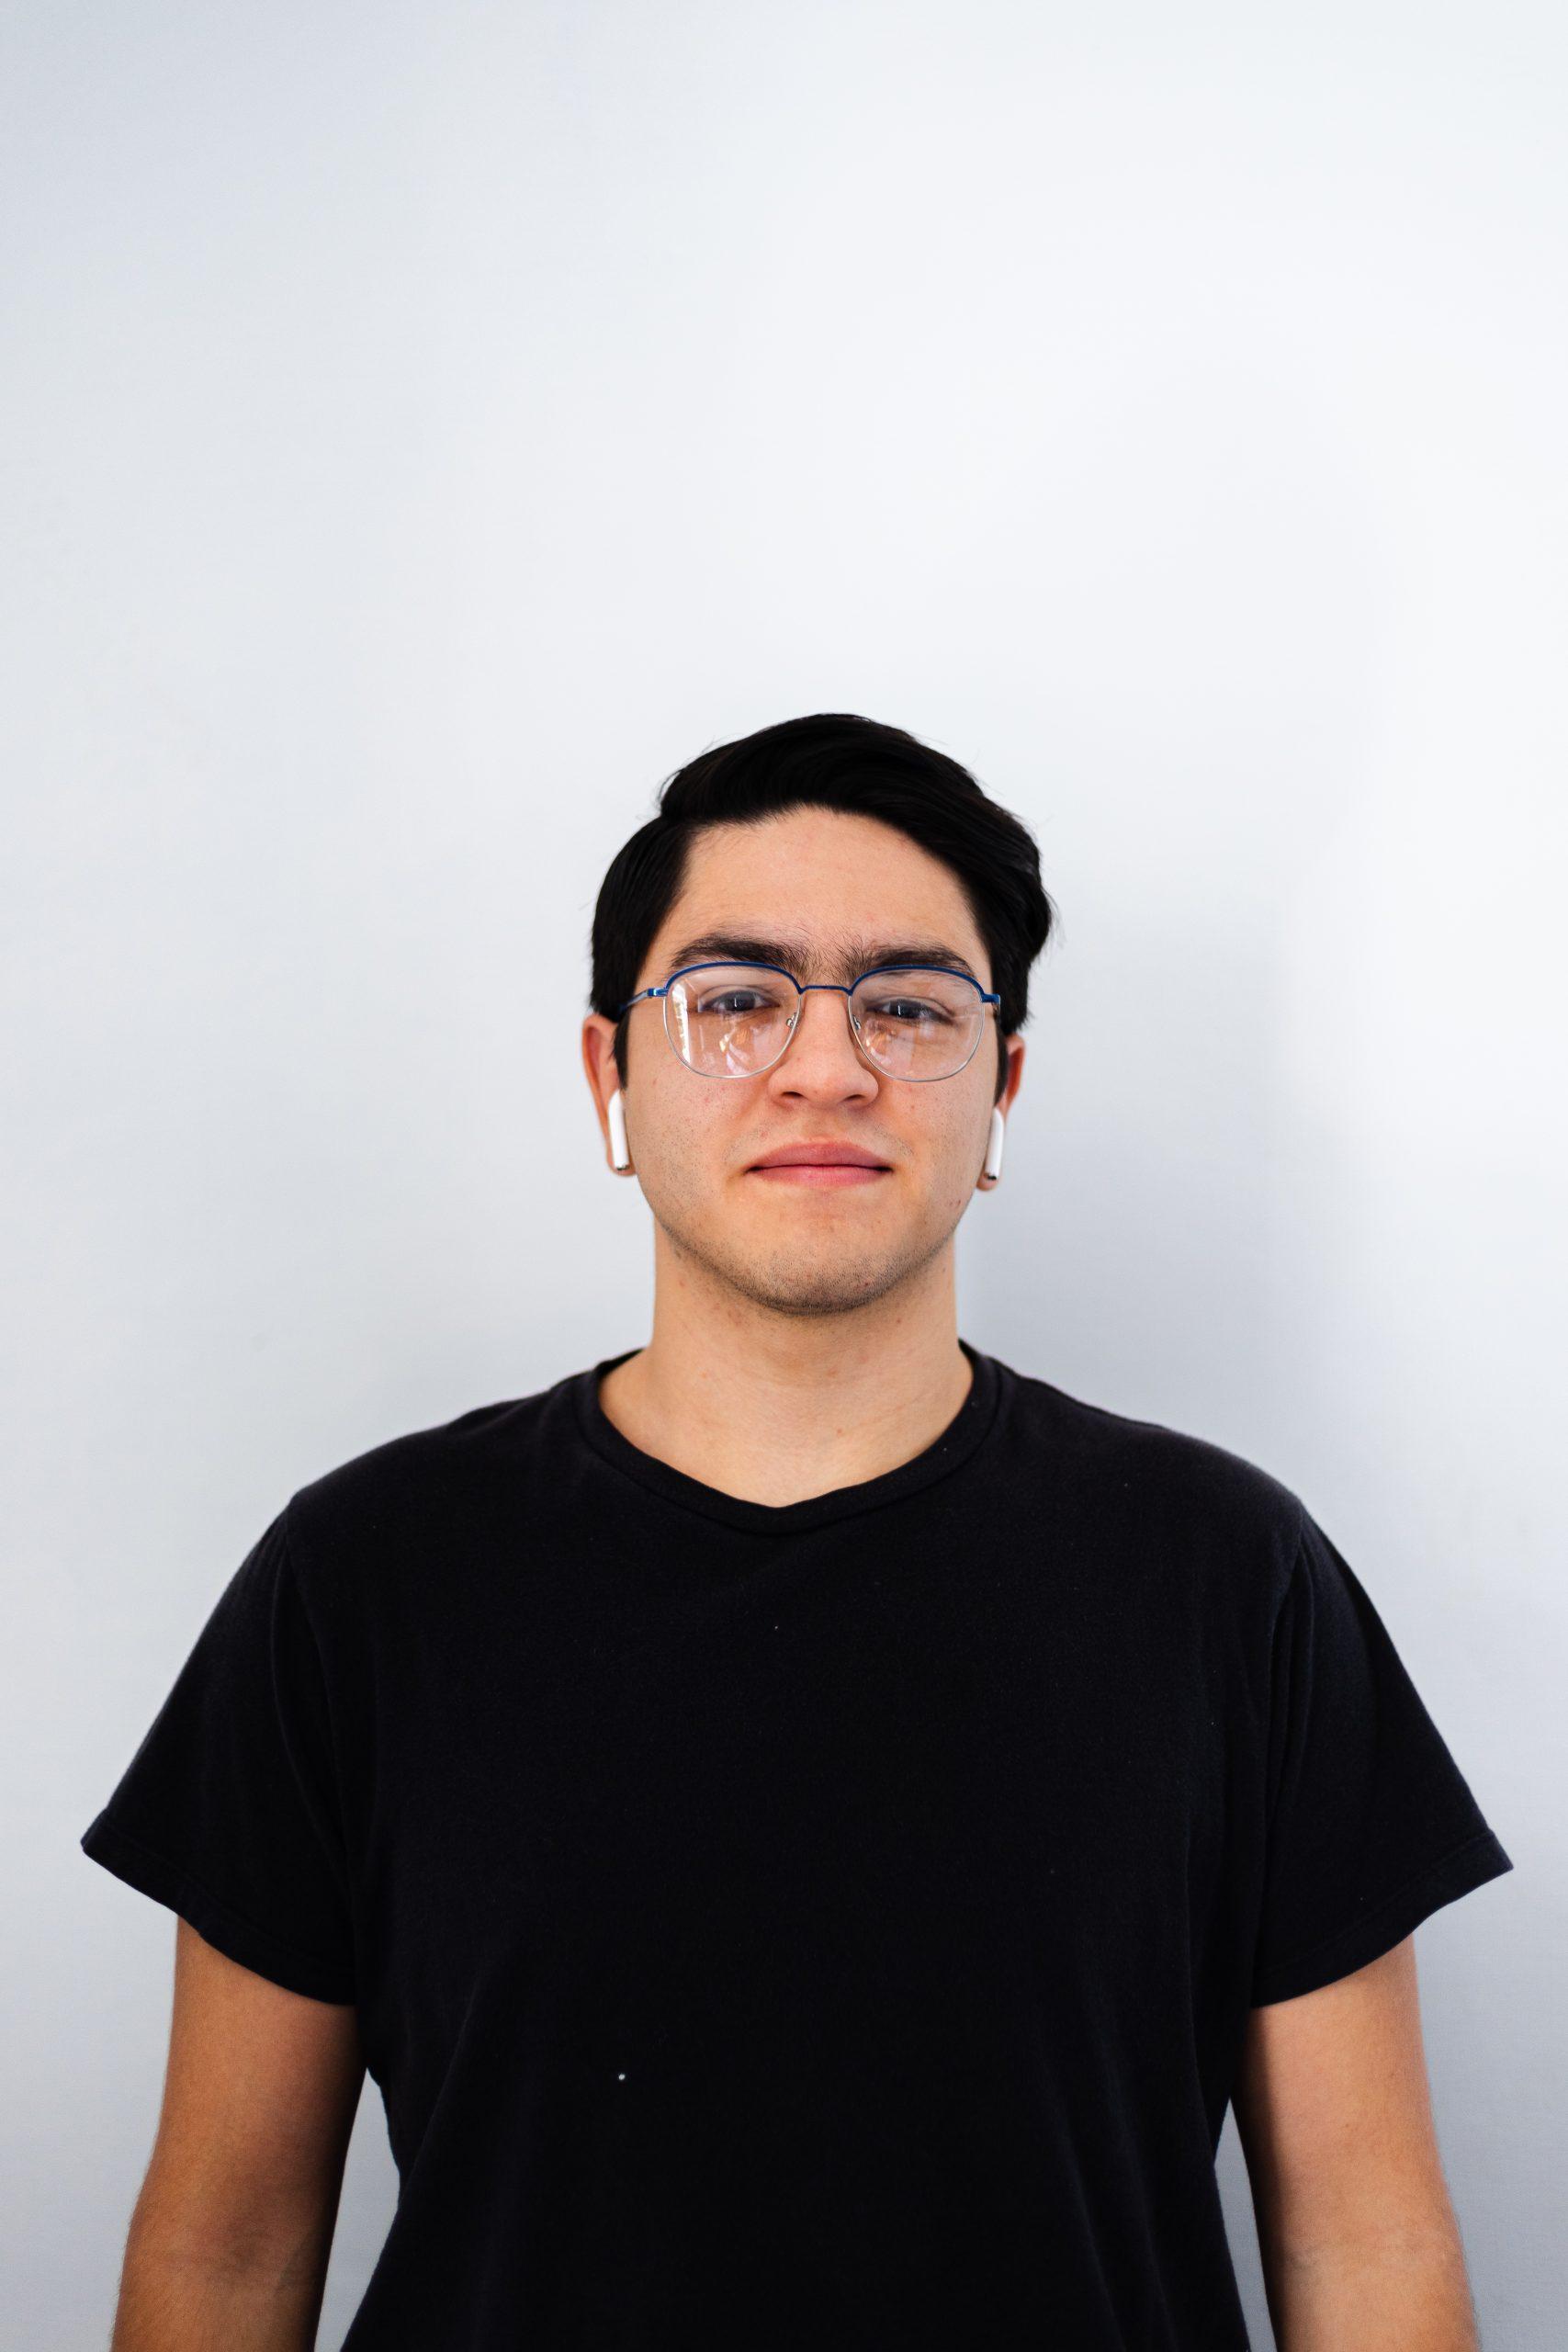 By Moises Hernández Zamarripa, Wizeline iOS Software Engineer